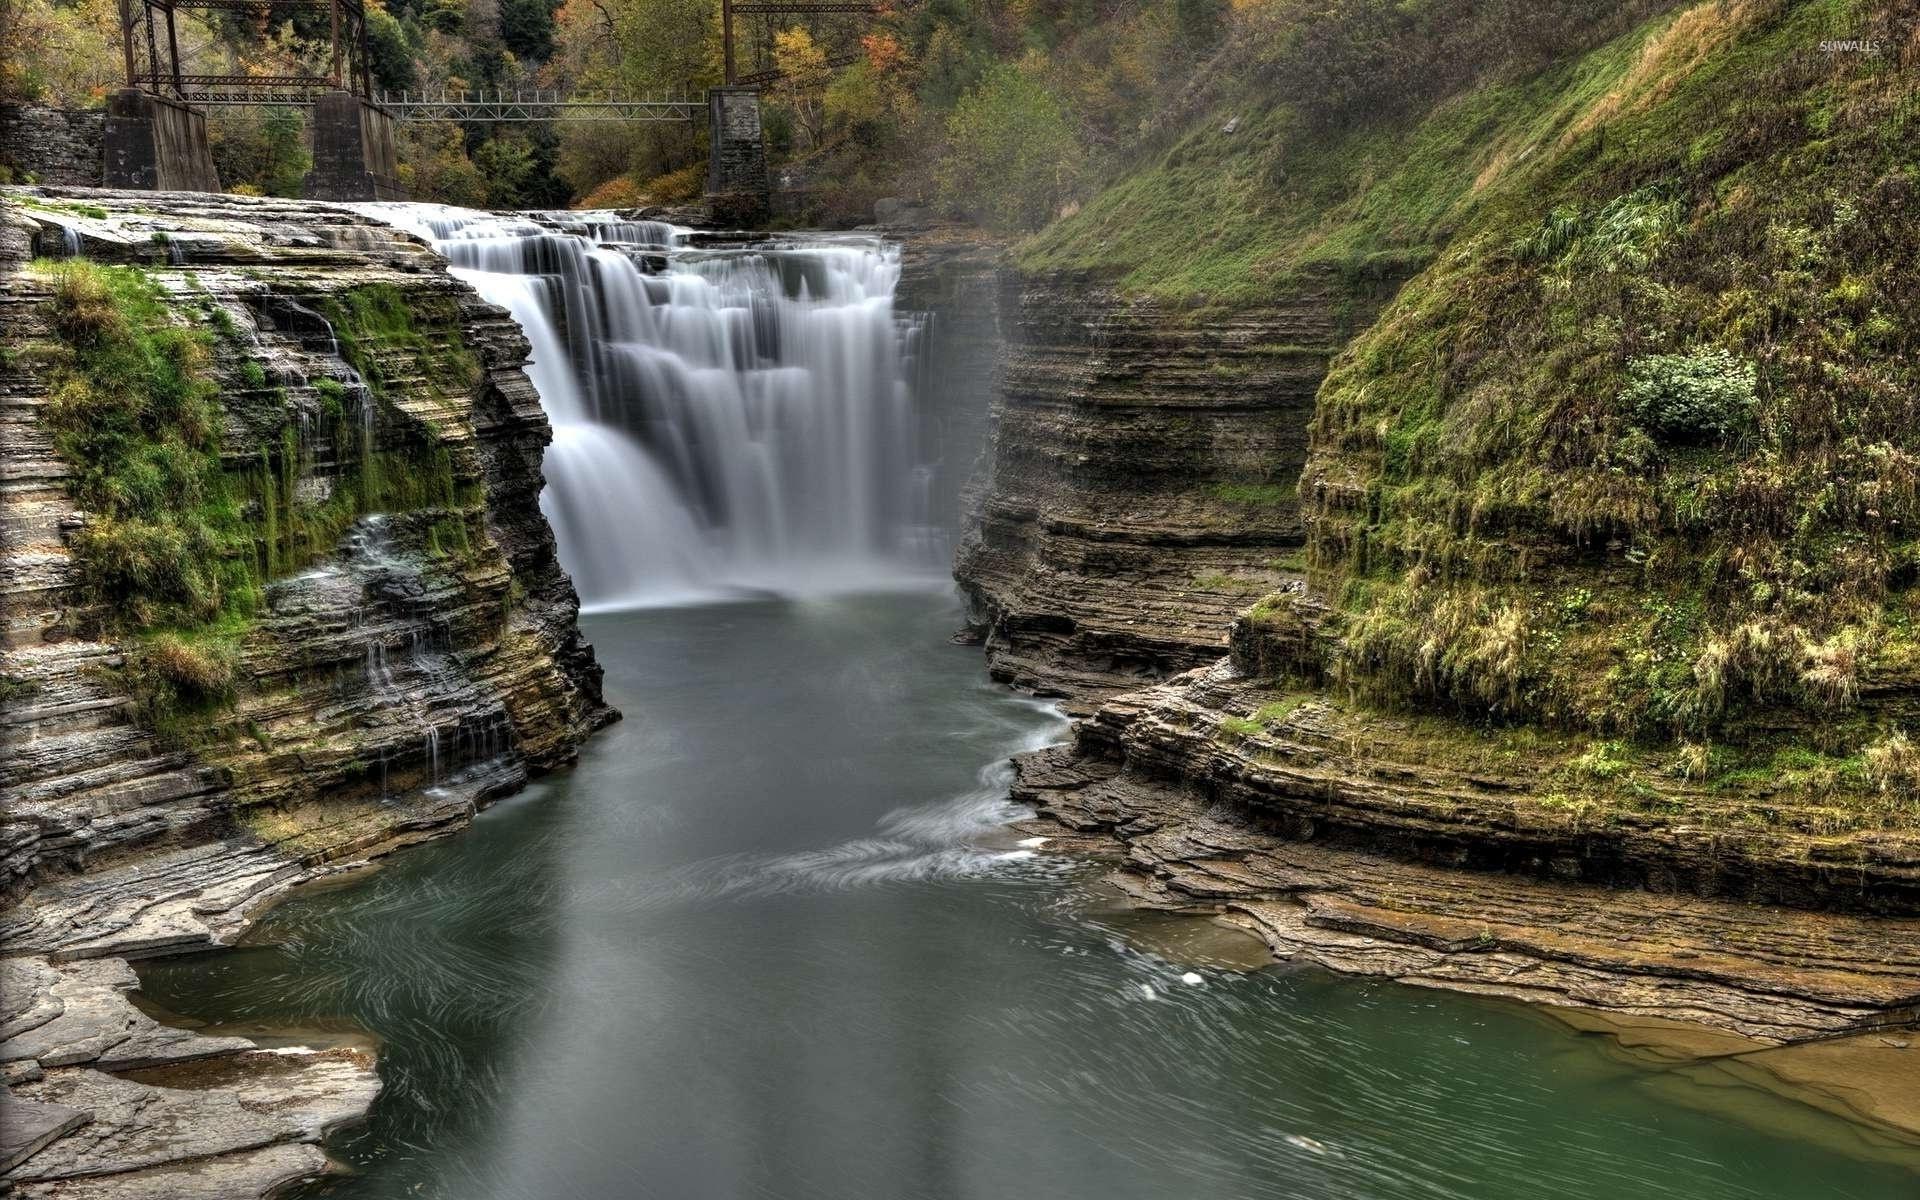 Niagara Falls Wallpaper Free Download Hd Wallpaper Waterfall Download Pixelstalk Net